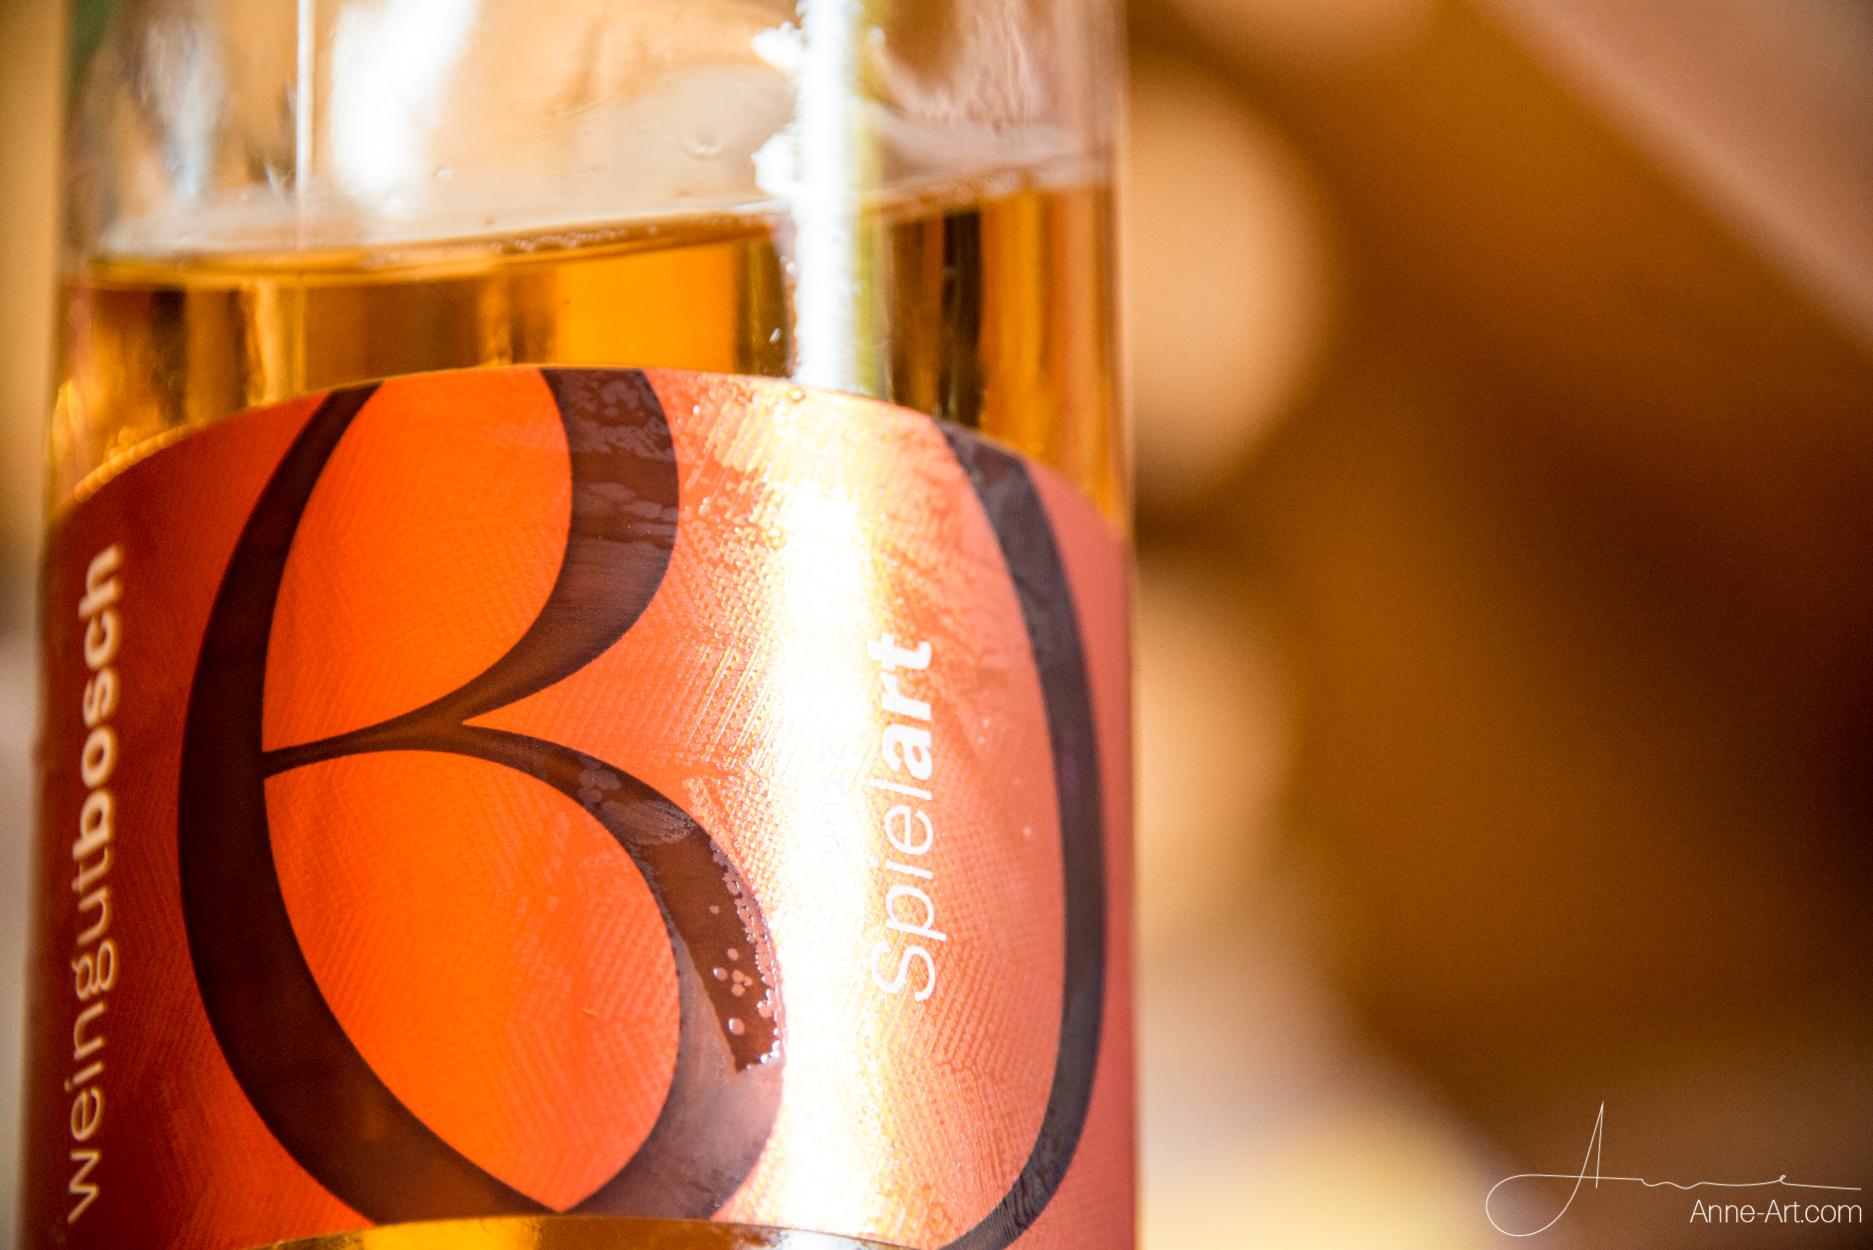 Spielart Weingut Bosch